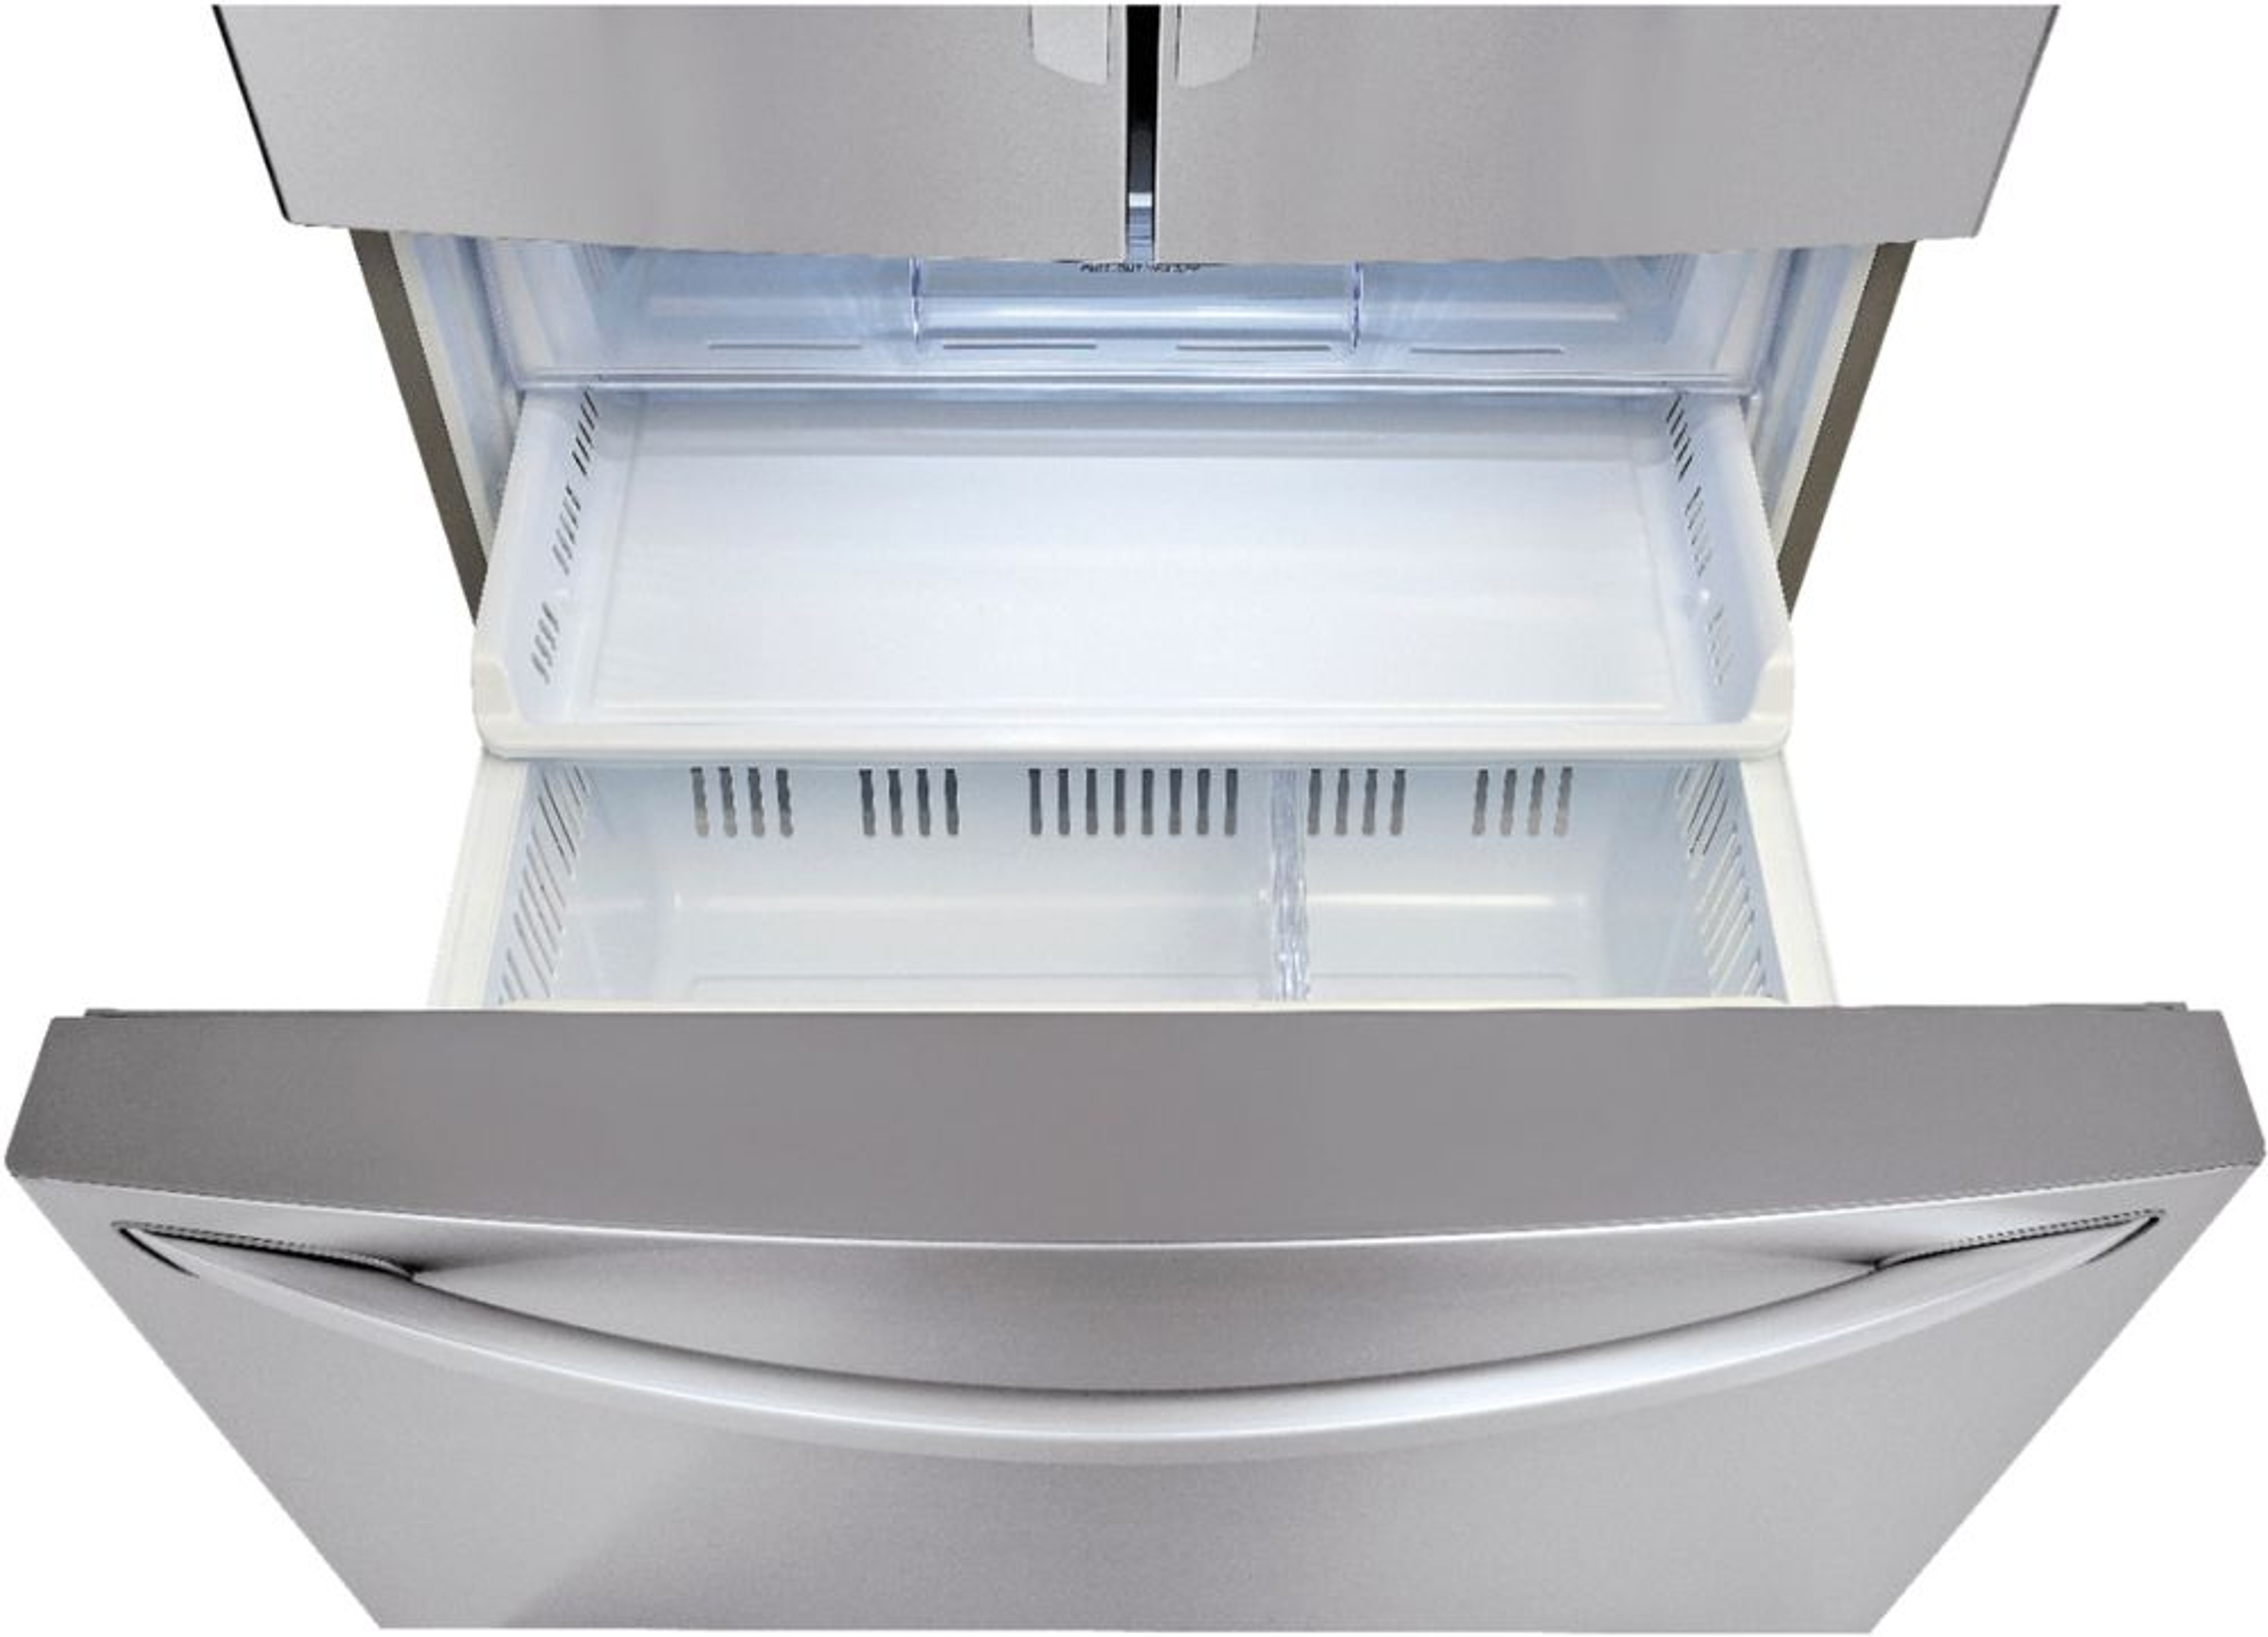 Lg 240 Cu Ft Counter Depth French Door Refrigerator With Thru